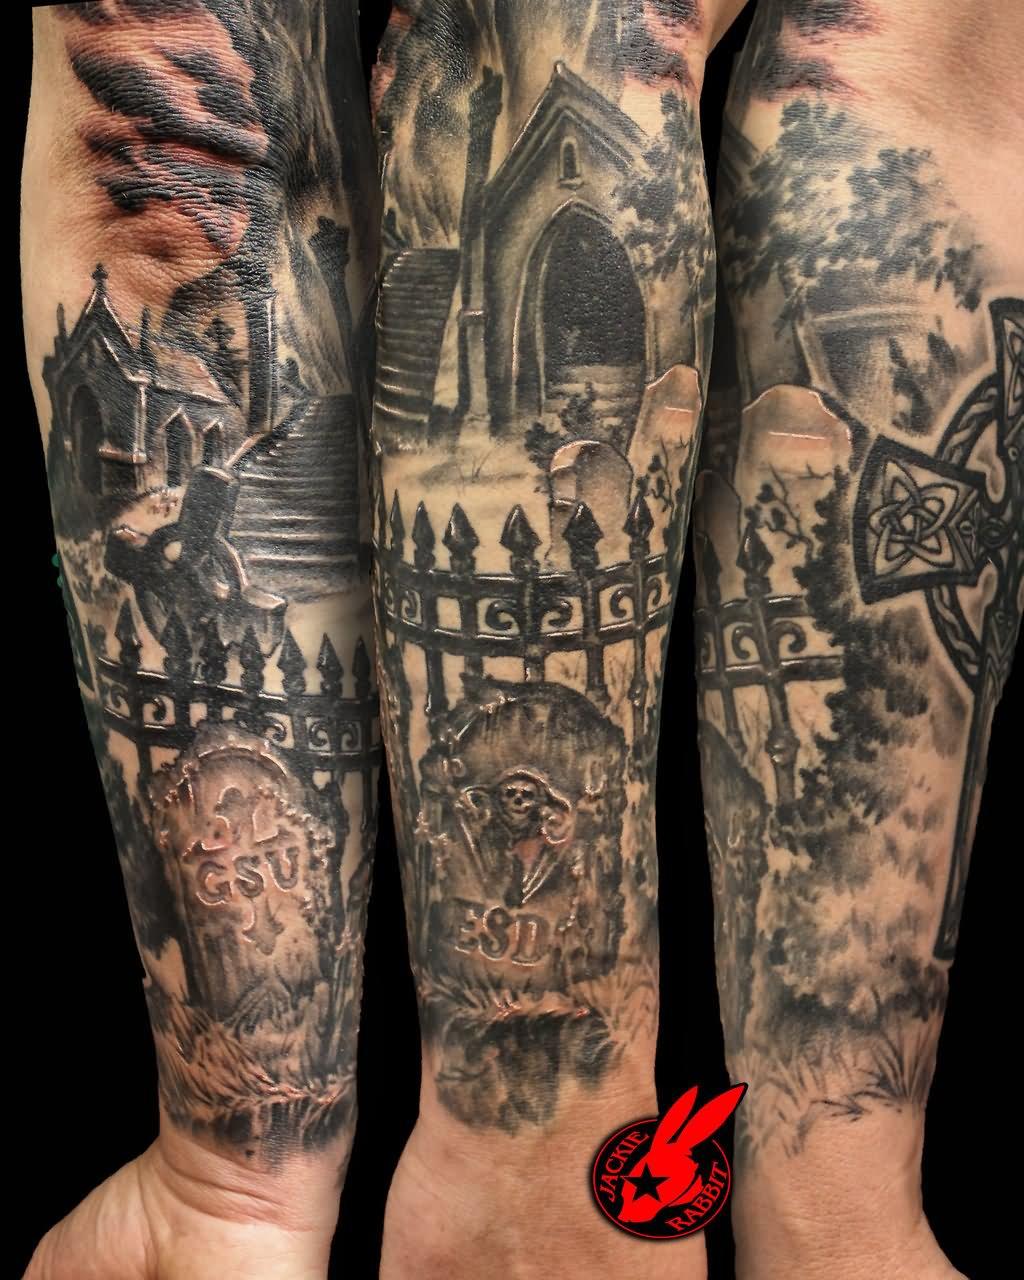 Cemetery and graveyard tattoo on half sleeve - Haunted Graveyard Tattoo On Sleeve By Jackie Rabbit